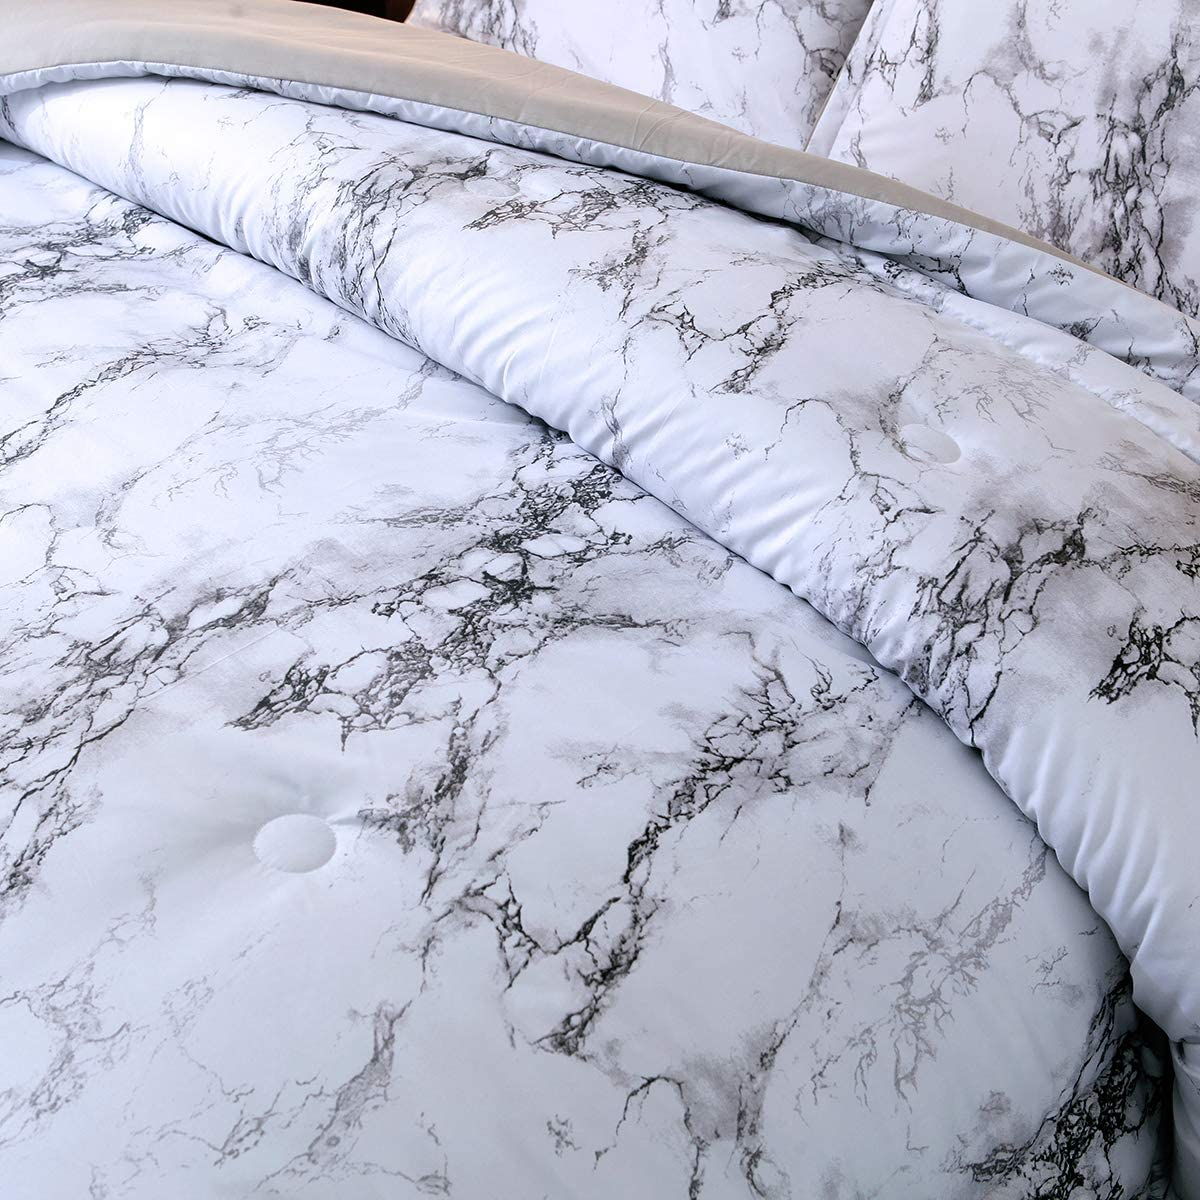 Marble Comforter Set Queen White Gray Marble Printed Bedding Solid Comforter Set for All Seasons 1 Comforter+2 Pillowcases 3 Pieces ,Soft Microfiber Inner Down Comforter Duvet Set